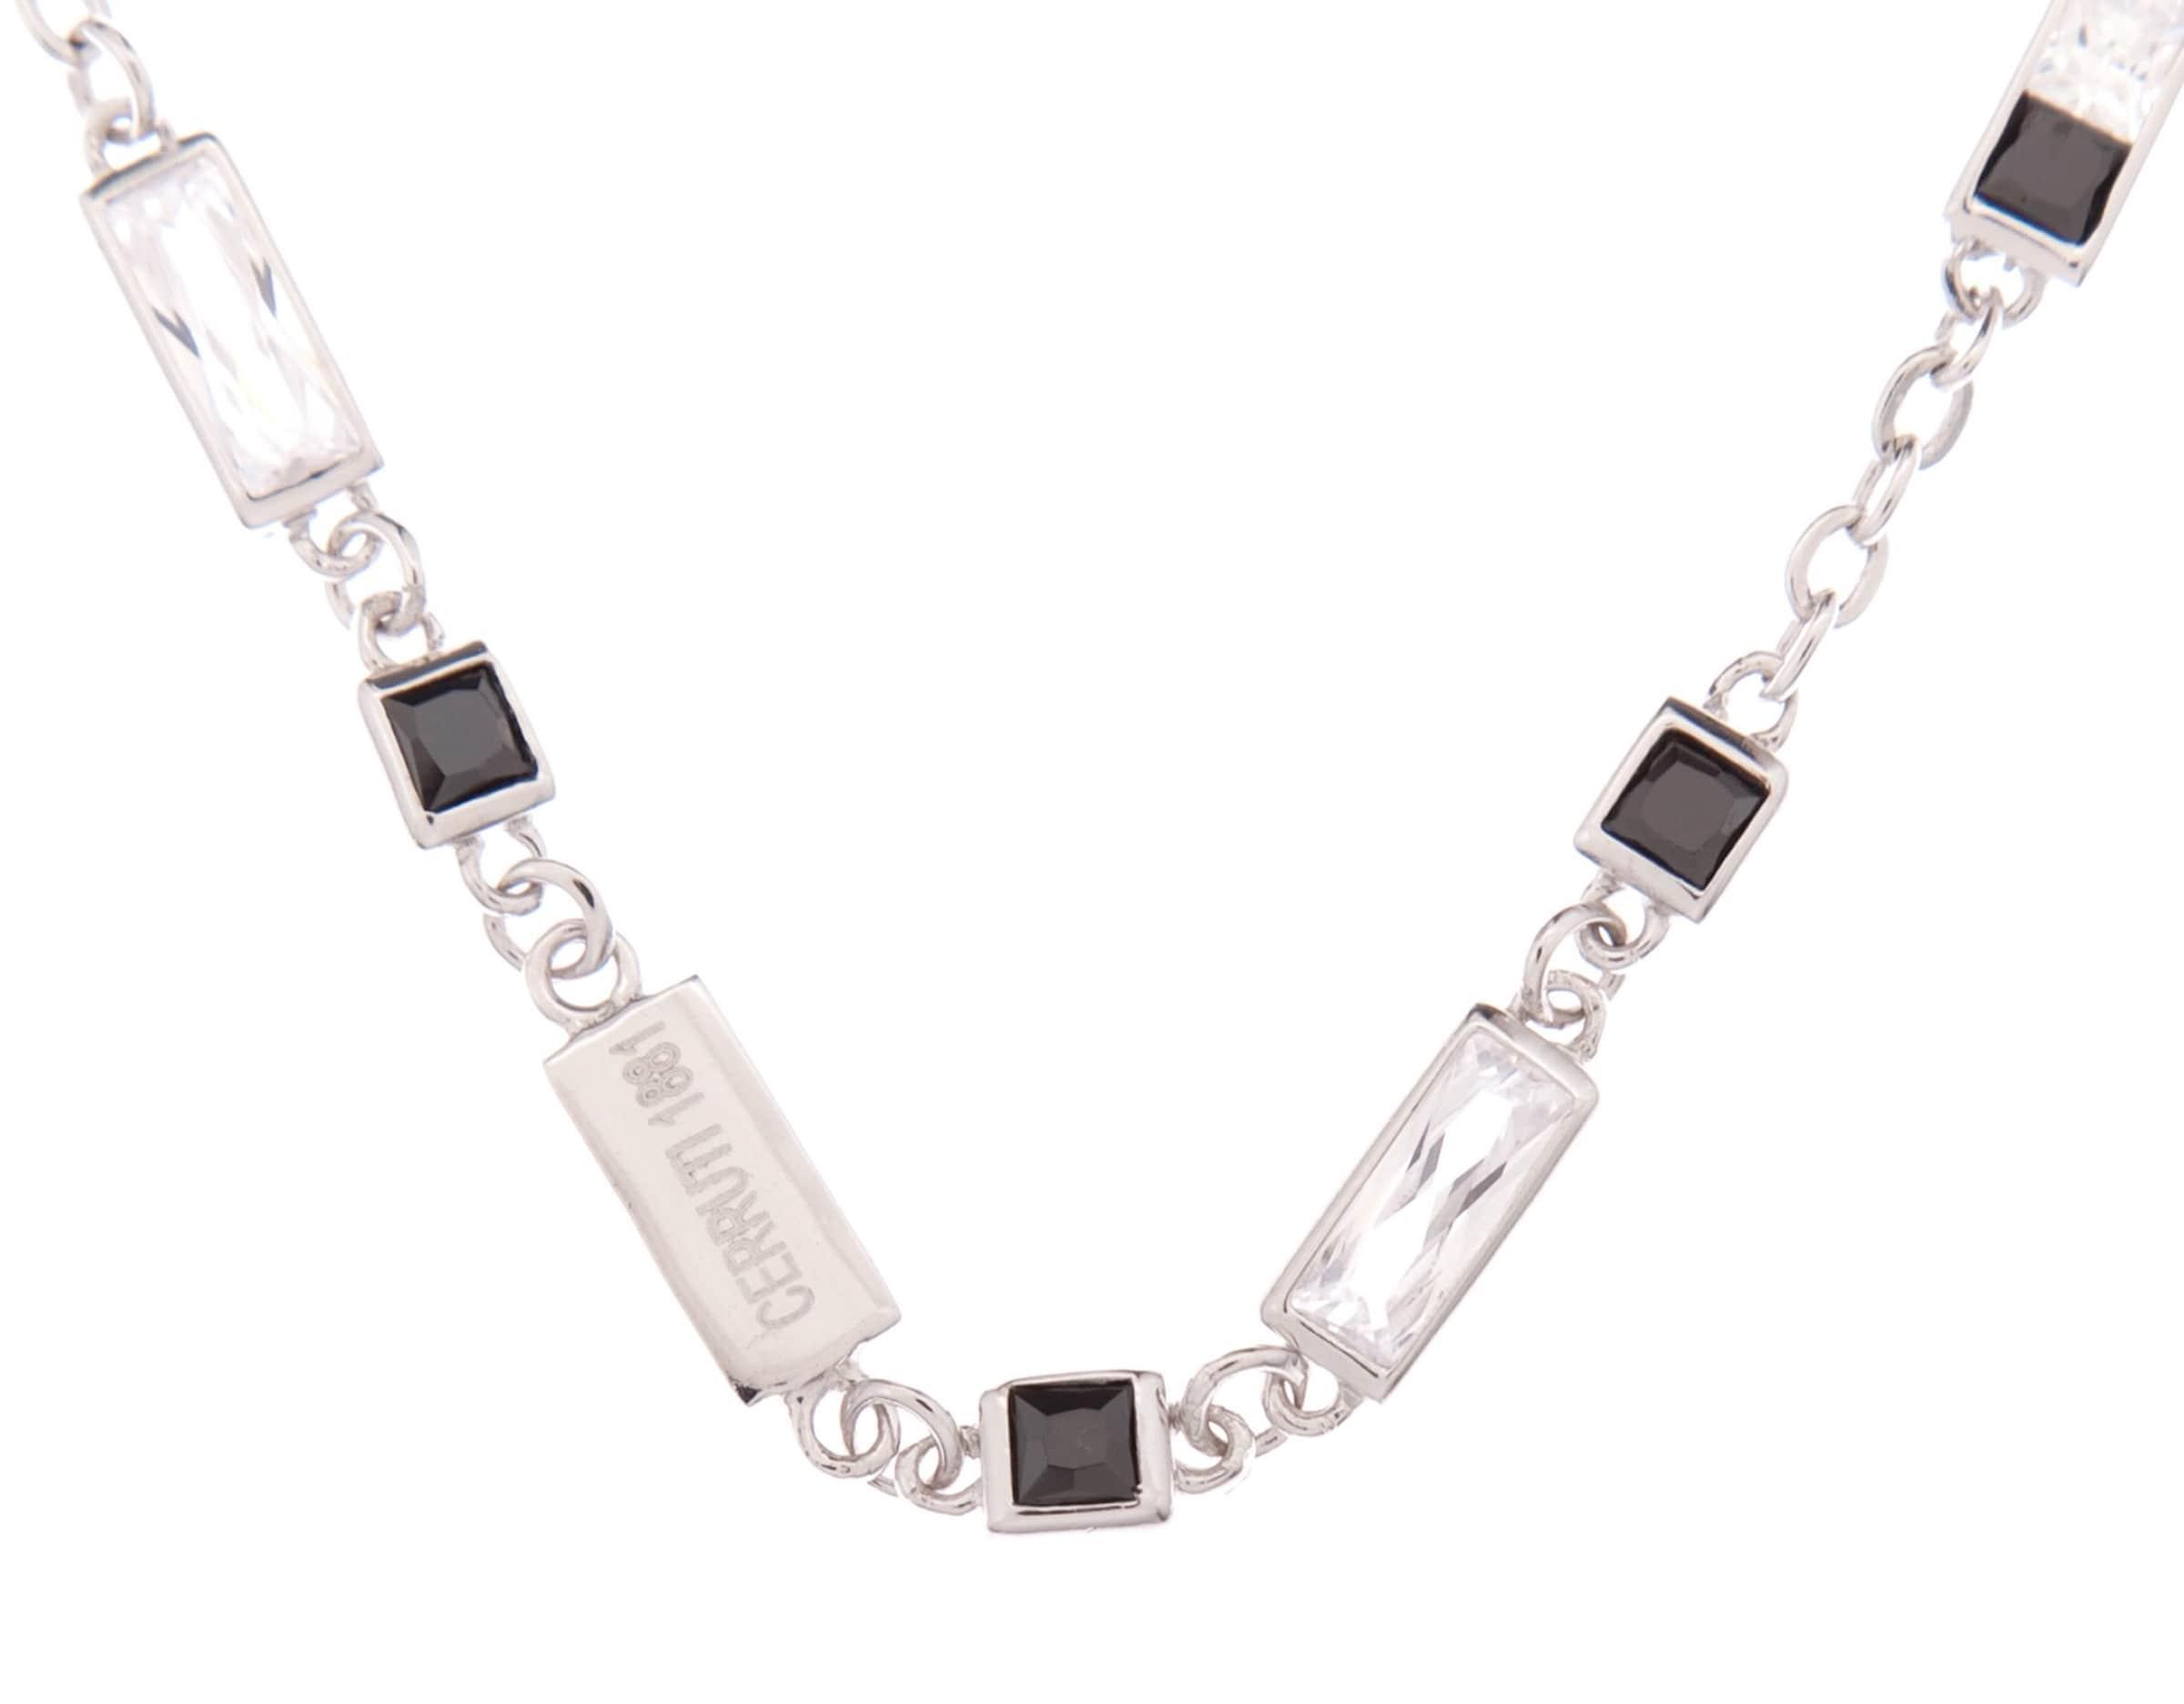 'R42004ZN76' Halskette Halskette Halskette Halskette Halskette CERRUTI CERRUTI 'R42004ZN76' 'R42004ZN76' CERRUTI 'R42004ZN76' CERRUTI CERRUTI wwIzPZ